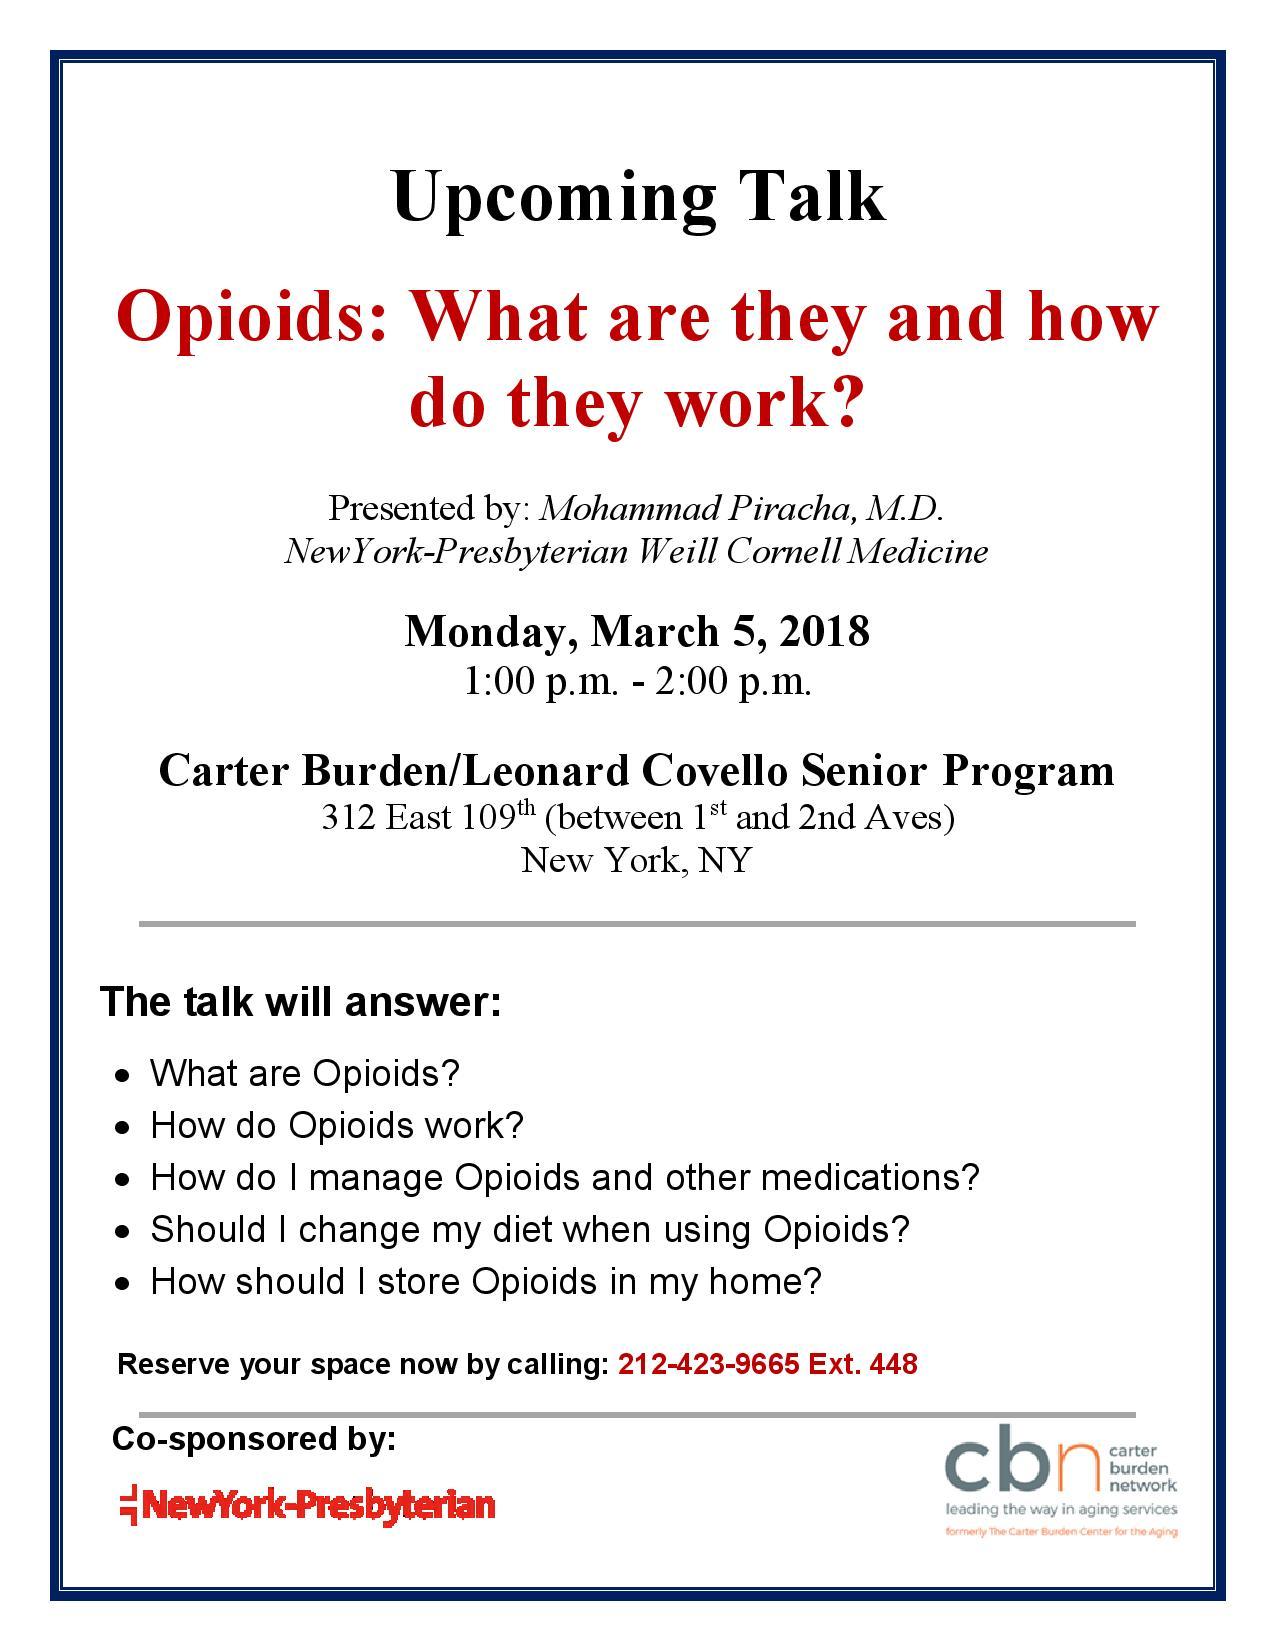 Opioids talk flyer.jpg